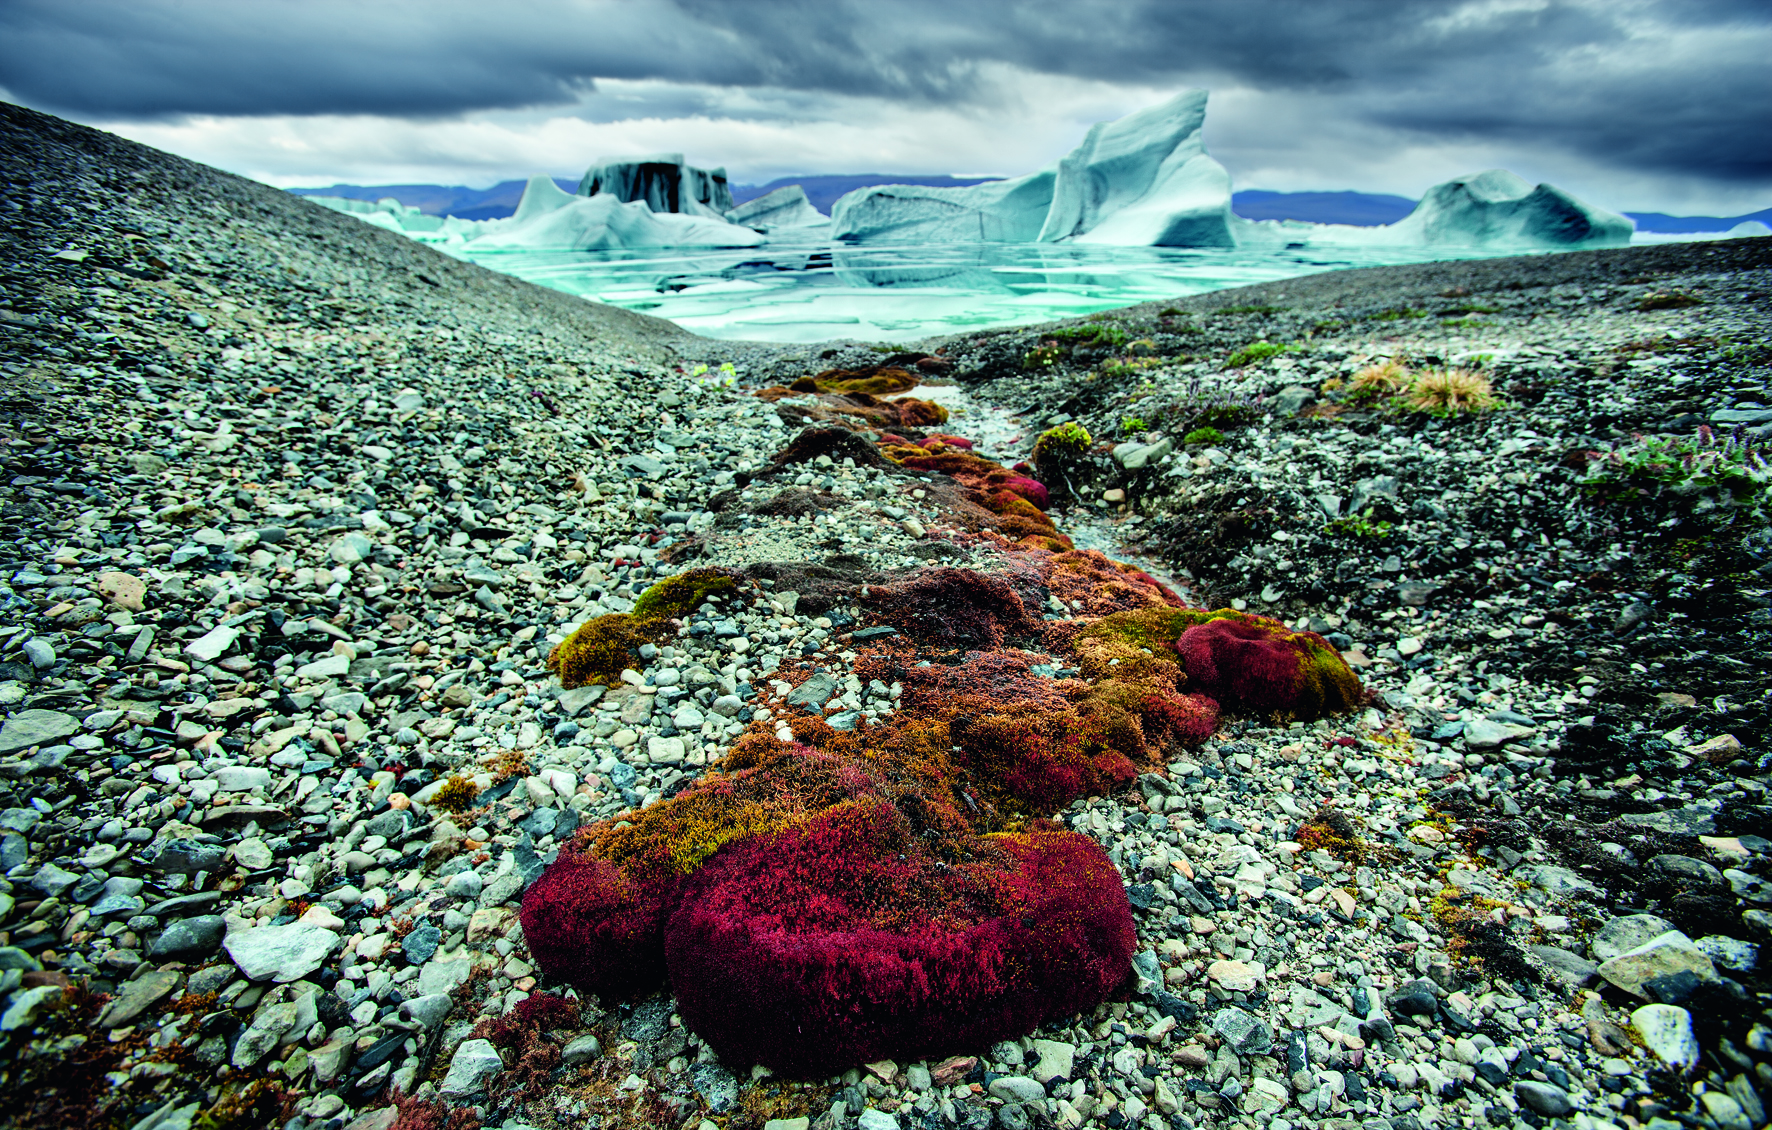 © Arctica: The Vanishing North by Sebastian Copeland, published by teNeues, www.teneues.com. Northern Greenland, Photo © 2015 Sebastian Copeland. All rights reserved. www.sebastiancopeland.com